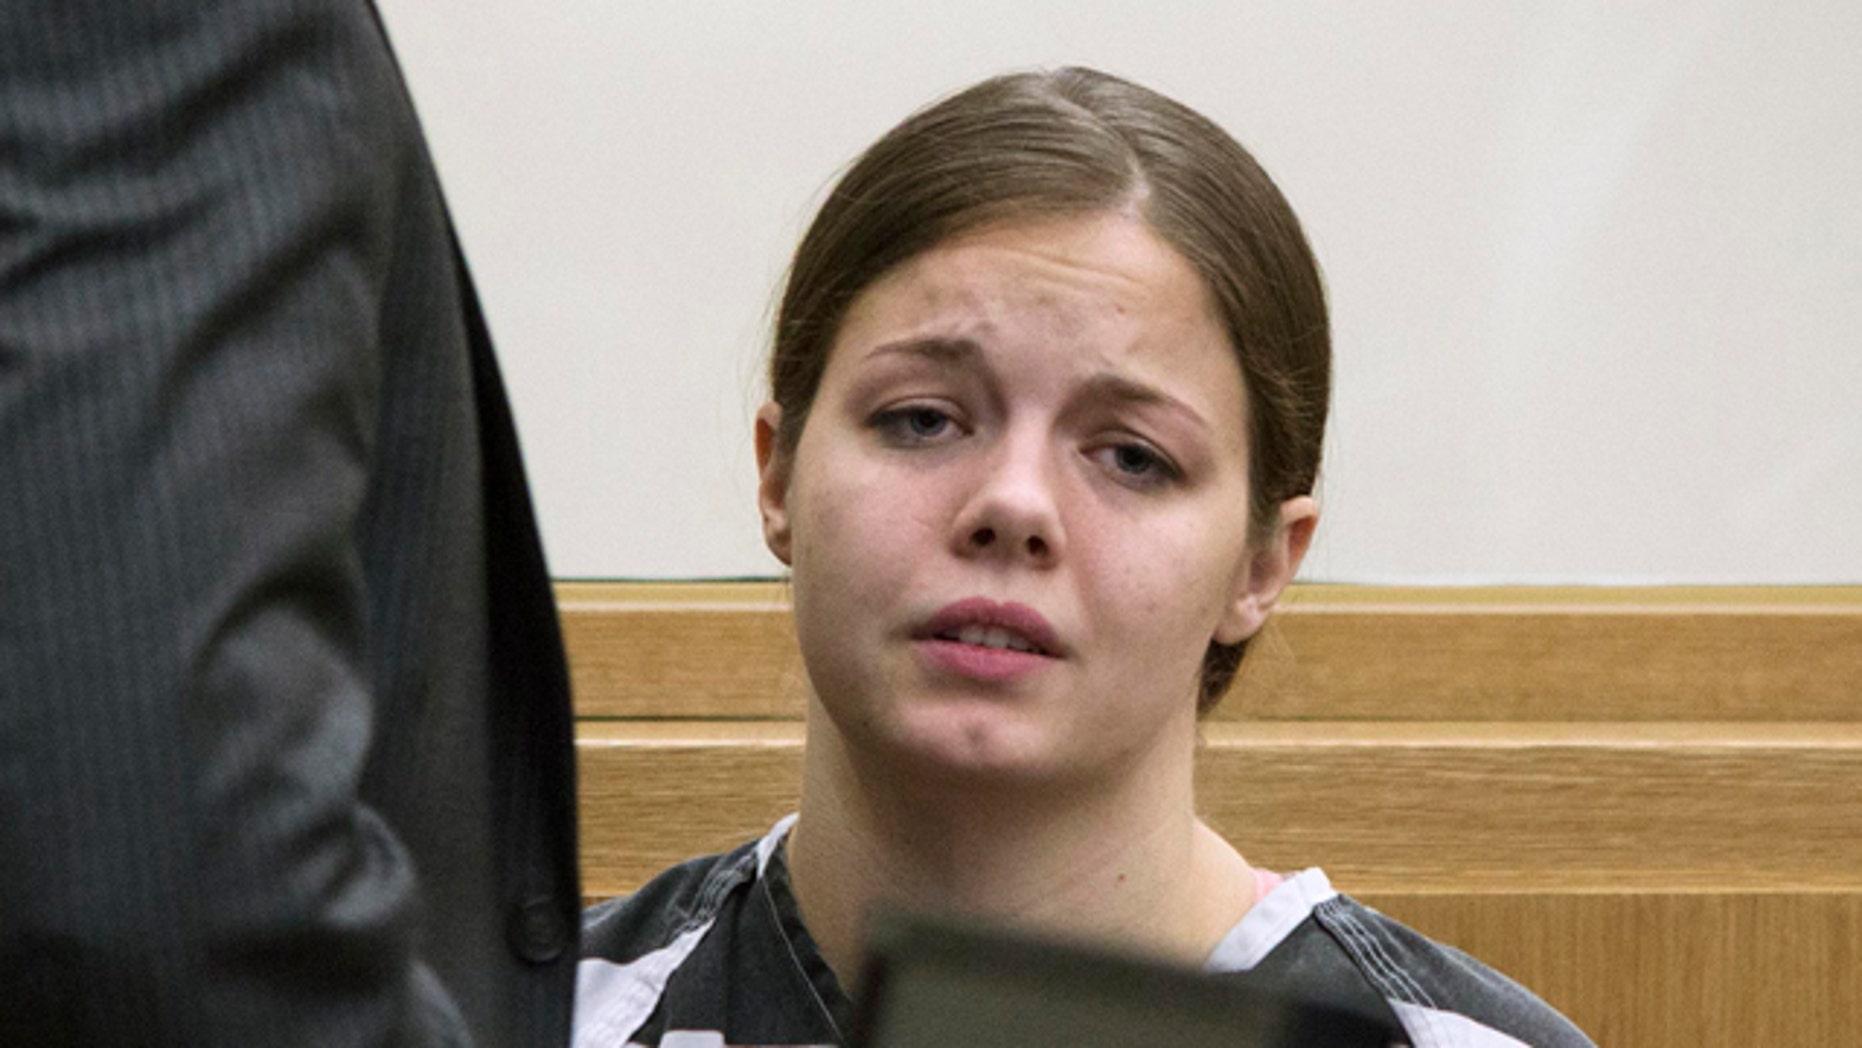 Dec. 7, 2012: Elizabeth Johnson is shown after being sentenced in Phoenix.